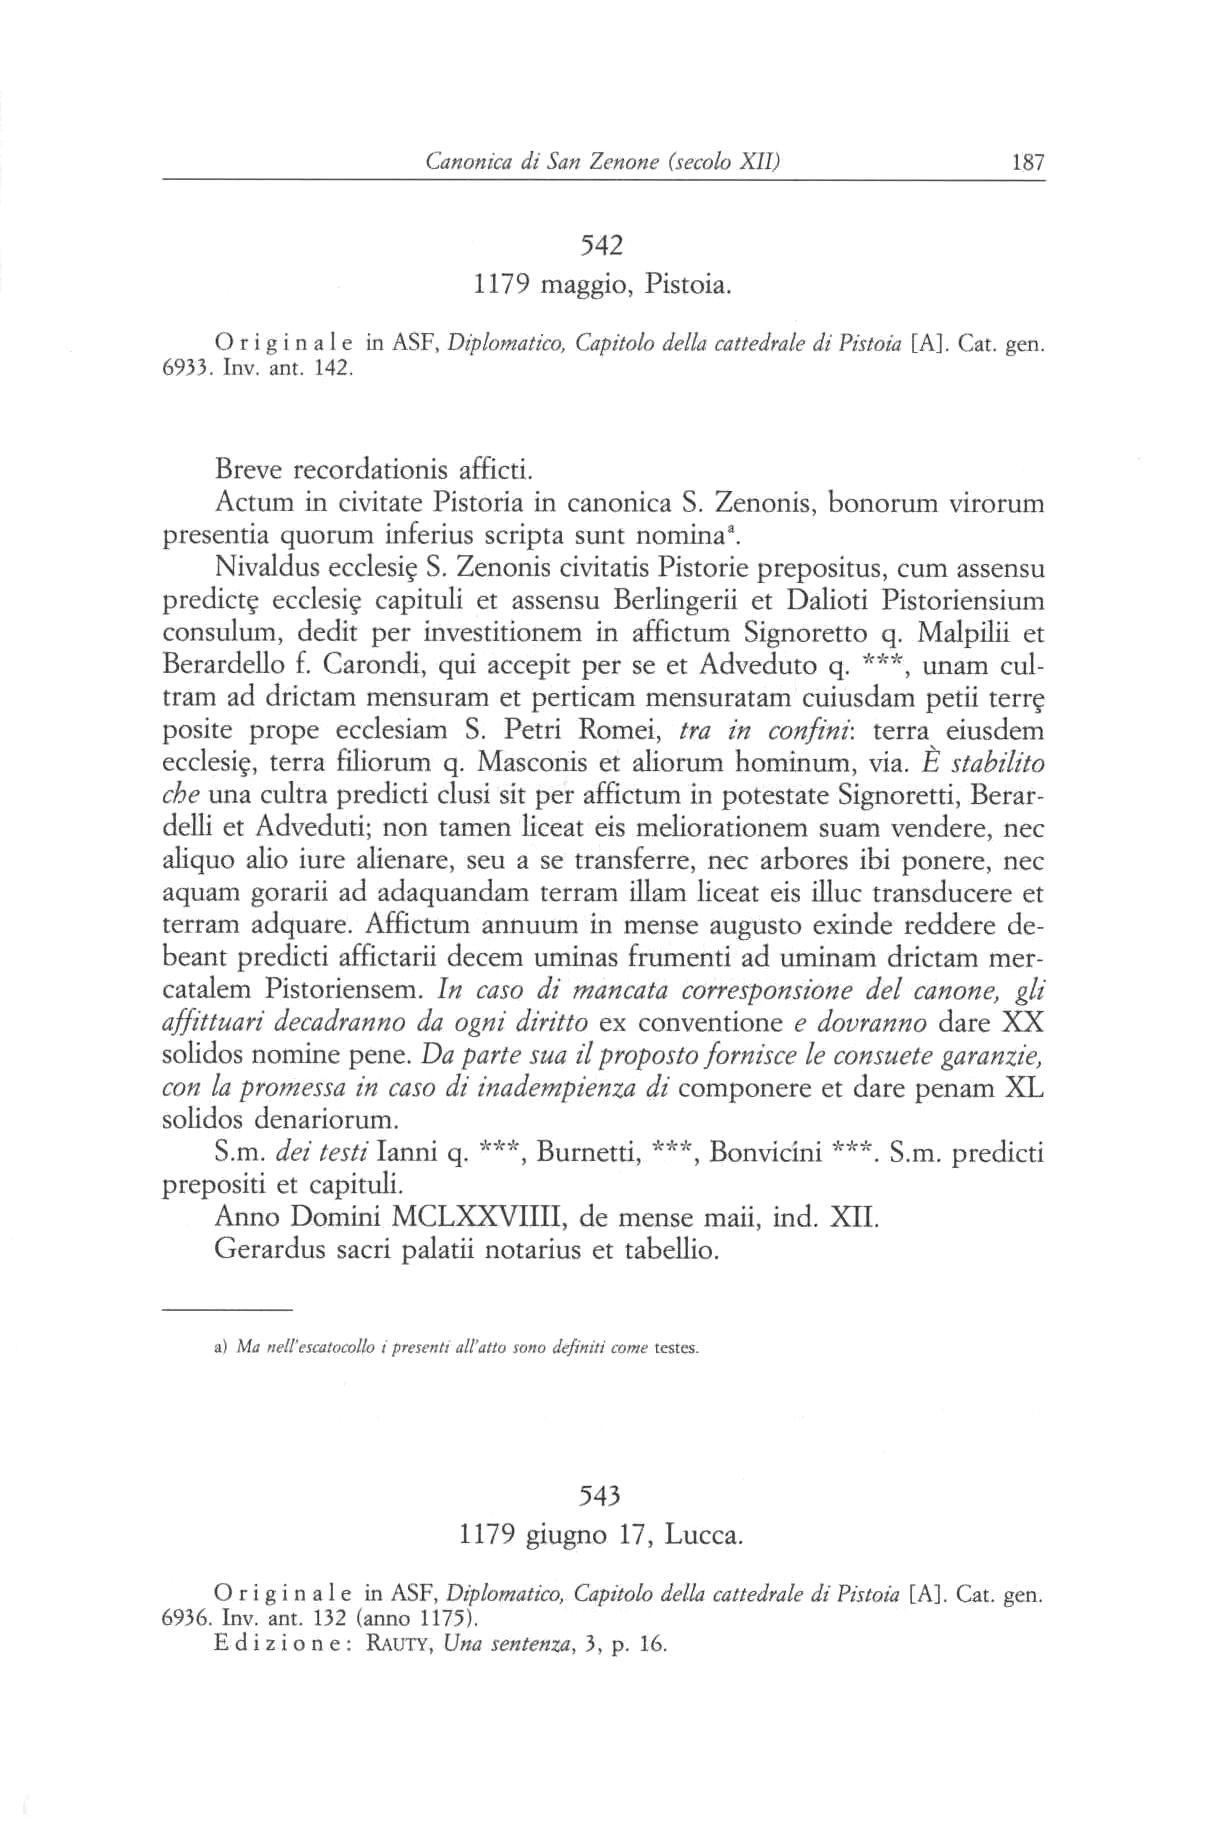 Canonica S. Zenone XII 0187.jpg